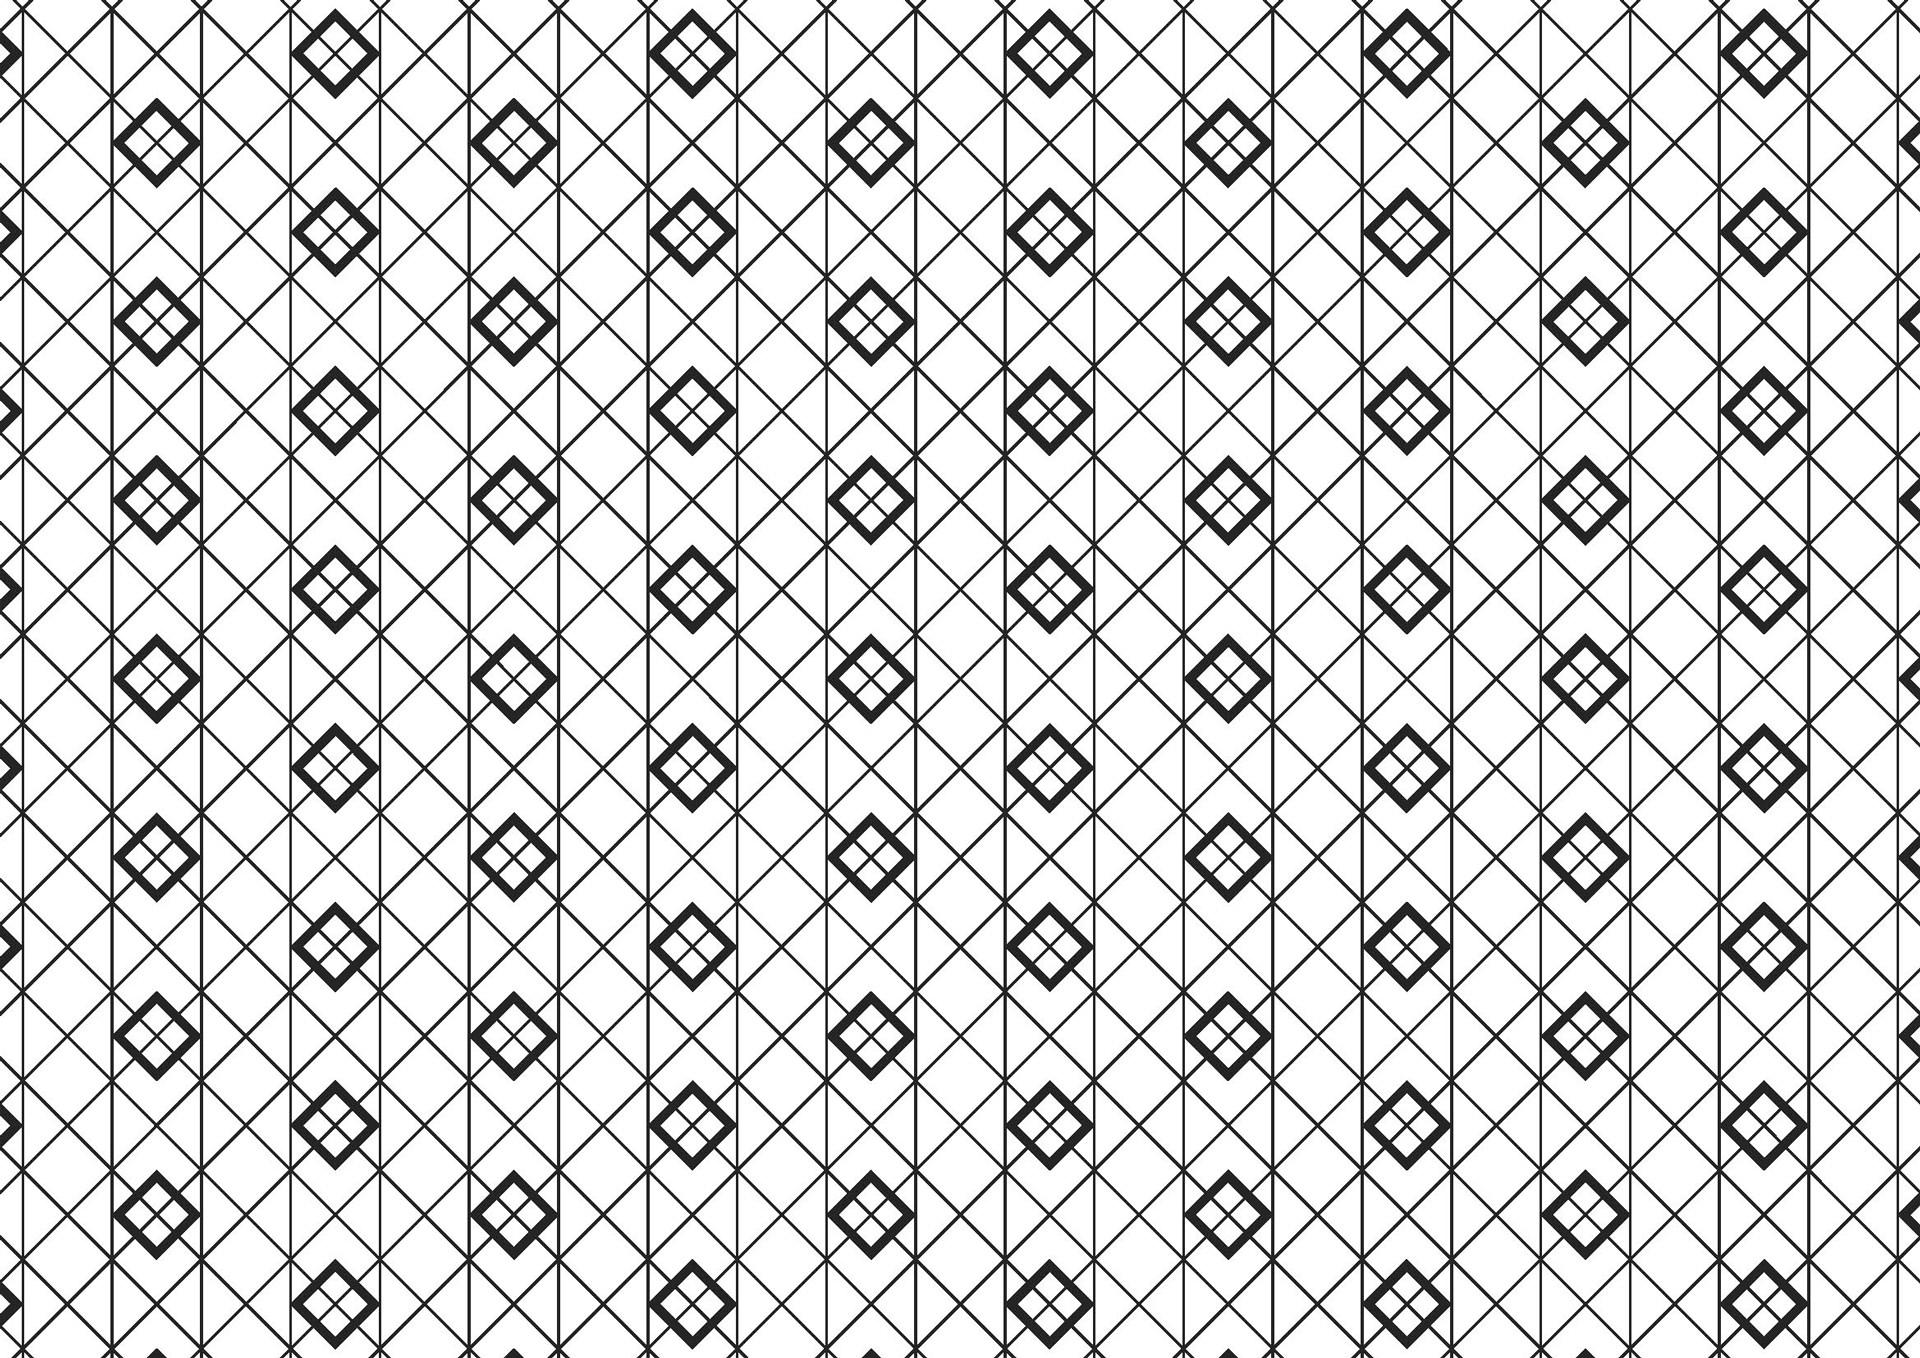 pattern_13